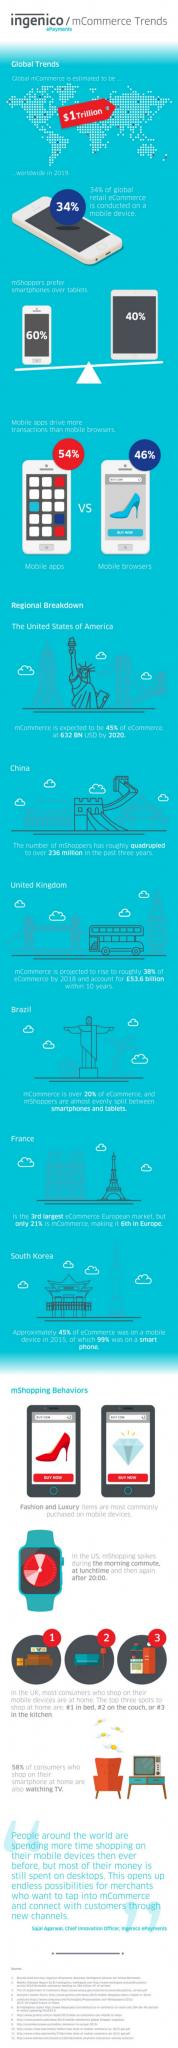 global-mcommerce-trends-ingenico